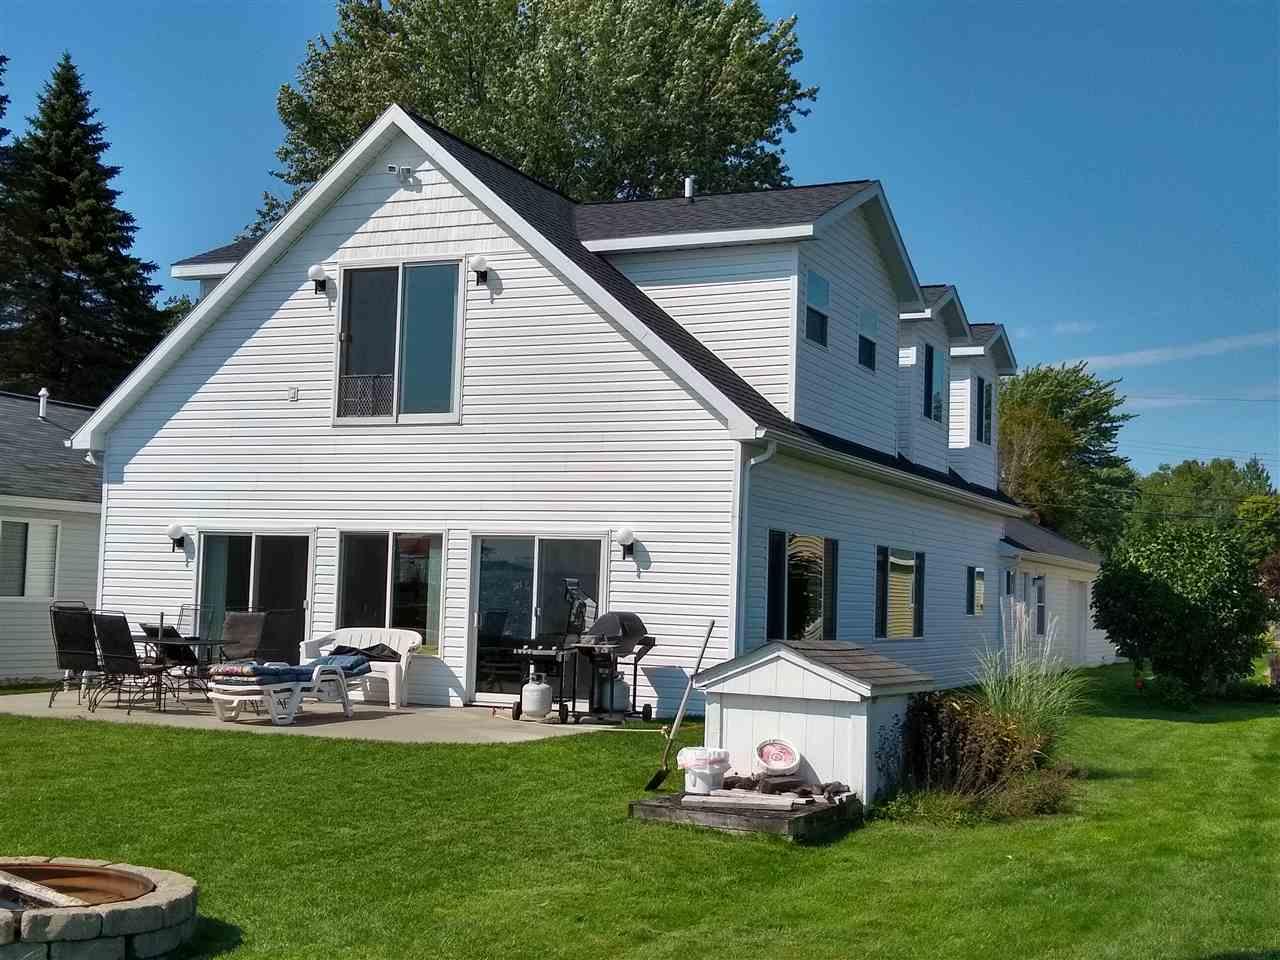 Michigan Waterfront Property: Resorts For Sale, Lake Rentals